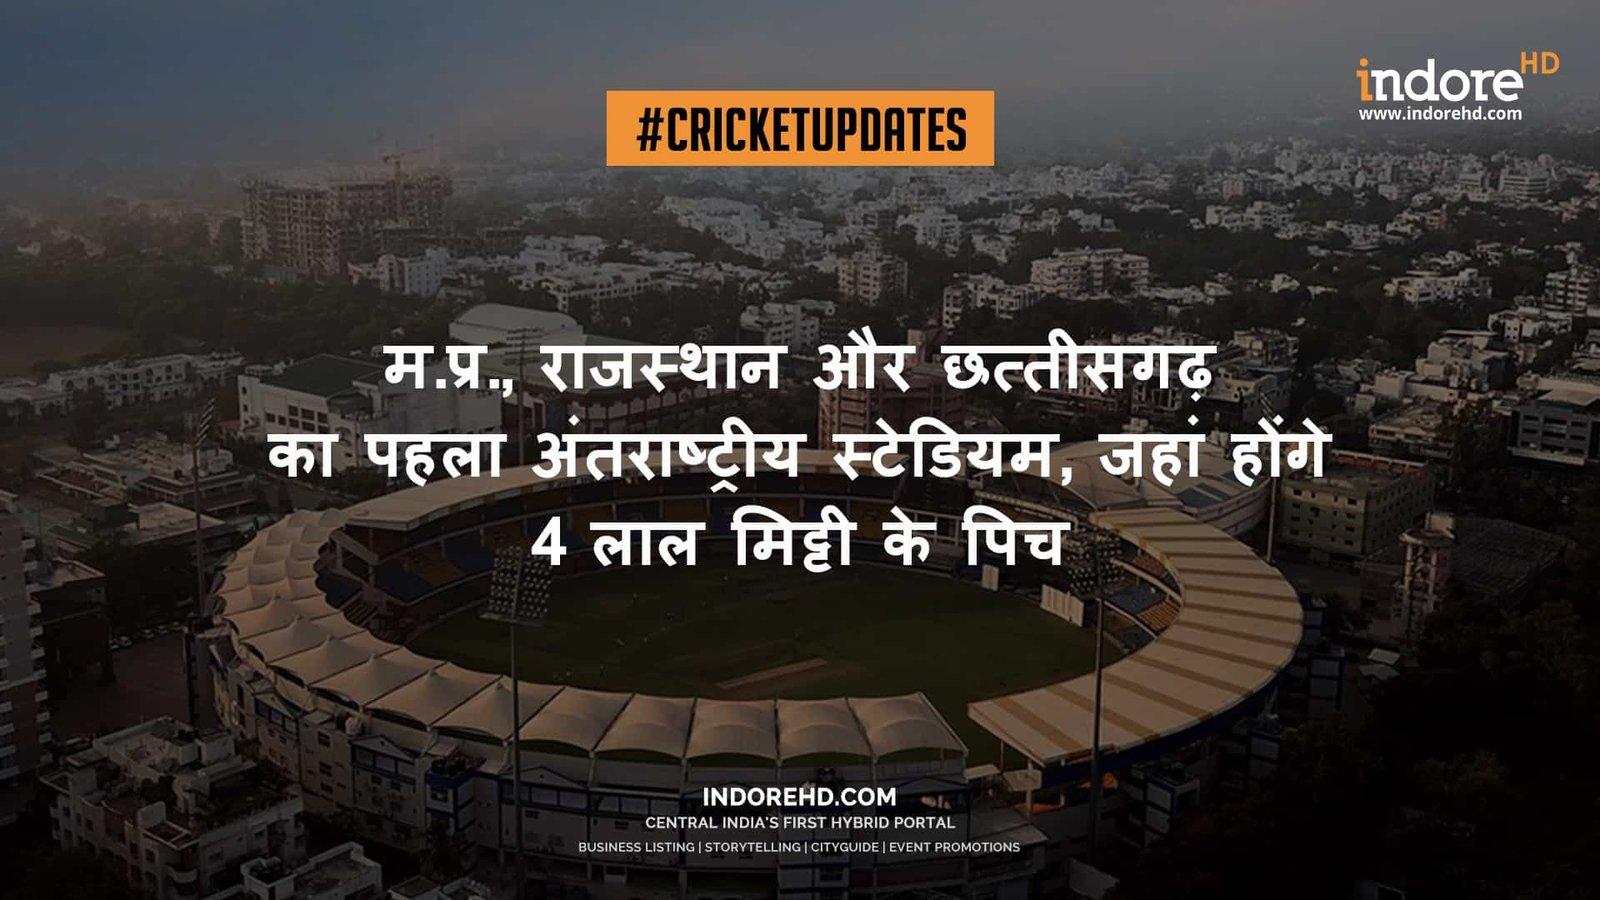 Holkar Stadium News Indore IndoreHD